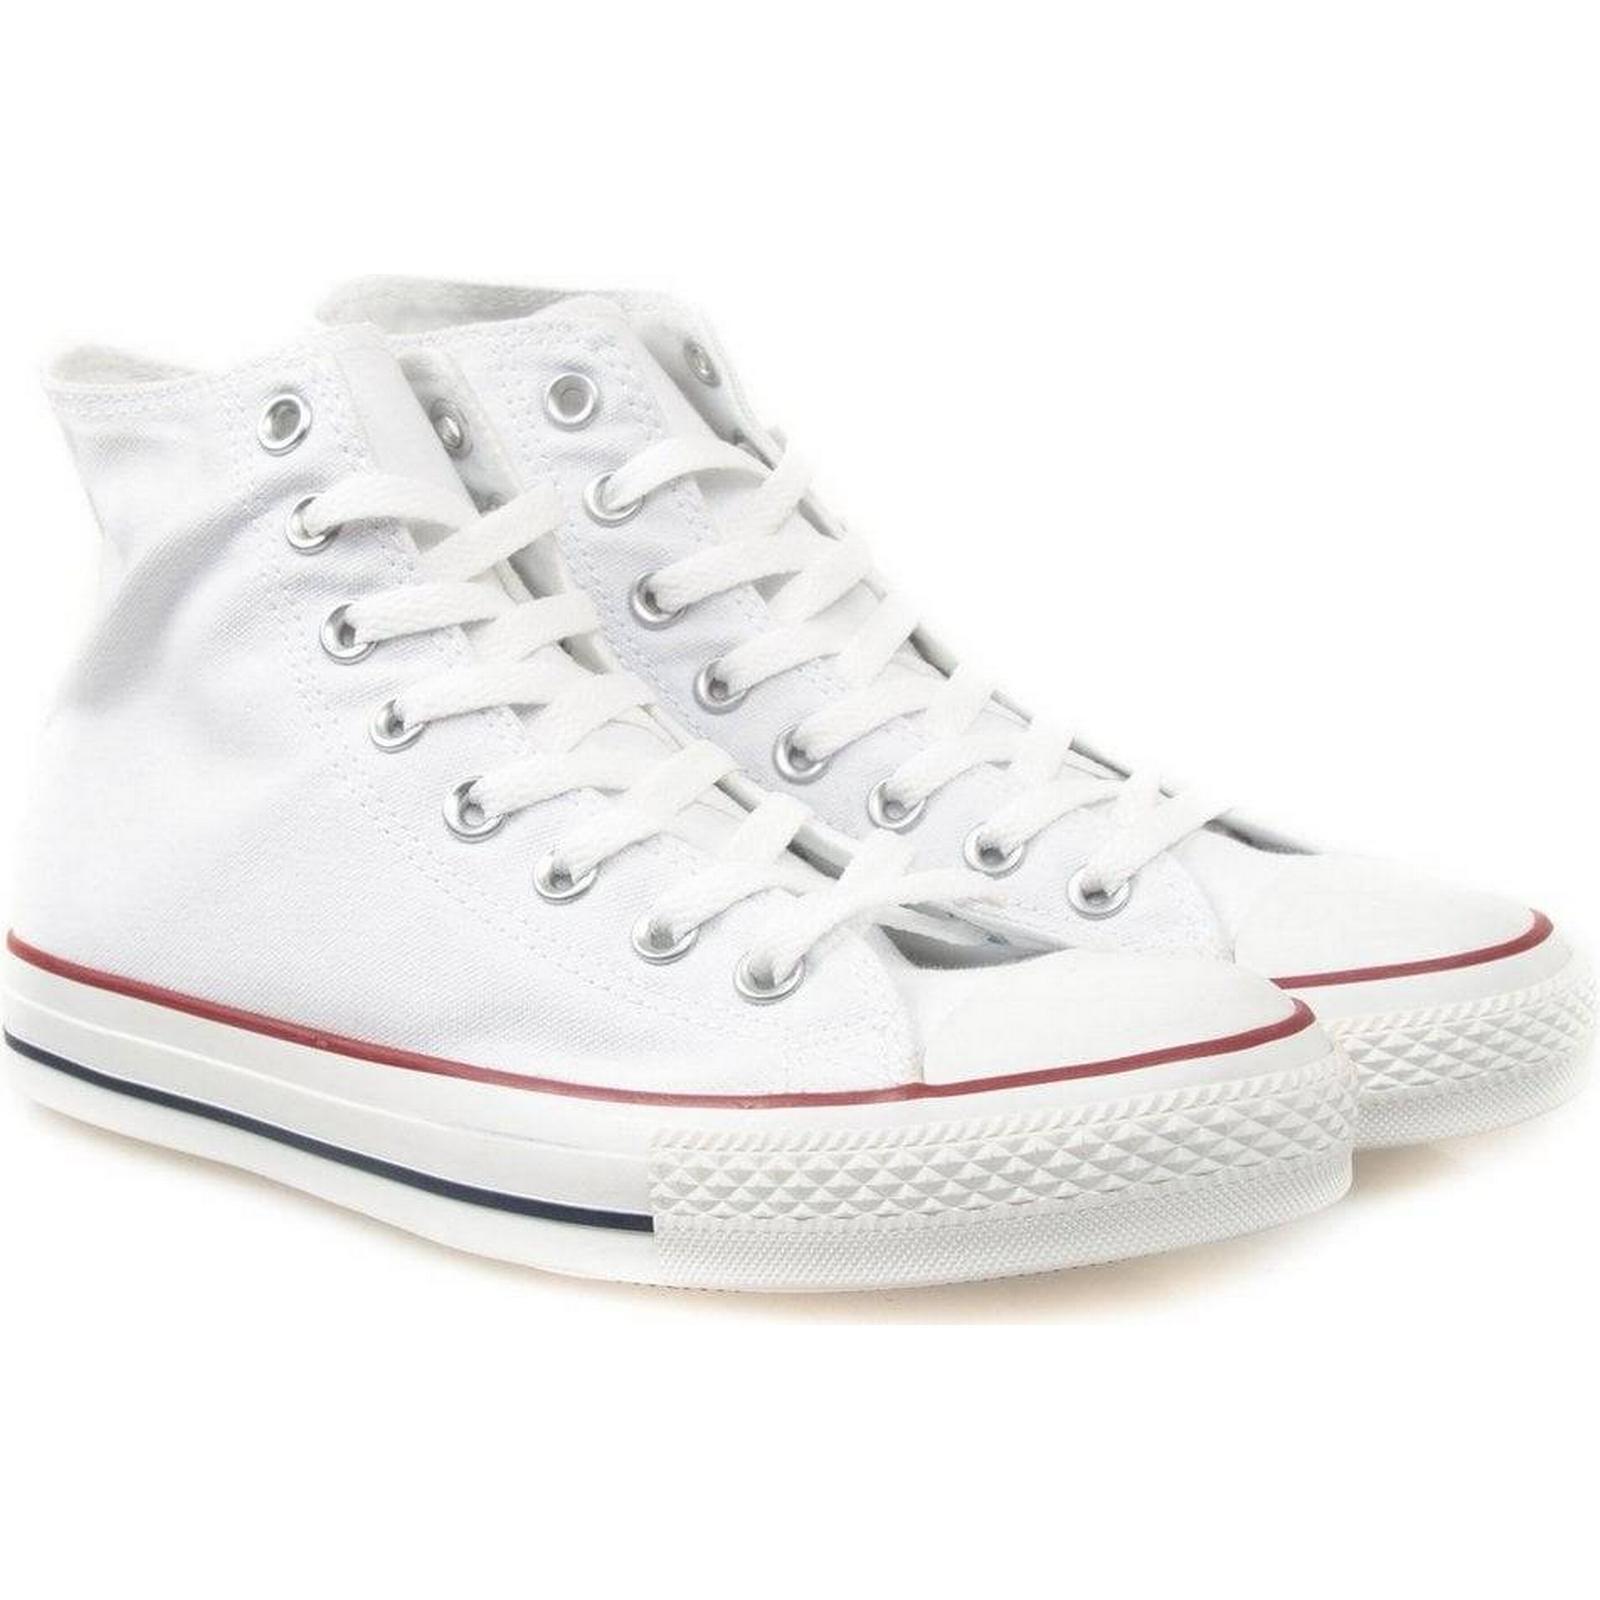 Converse Colour: All Star Hi - Optical White Colour: Converse White, Size: UK 12 71575c